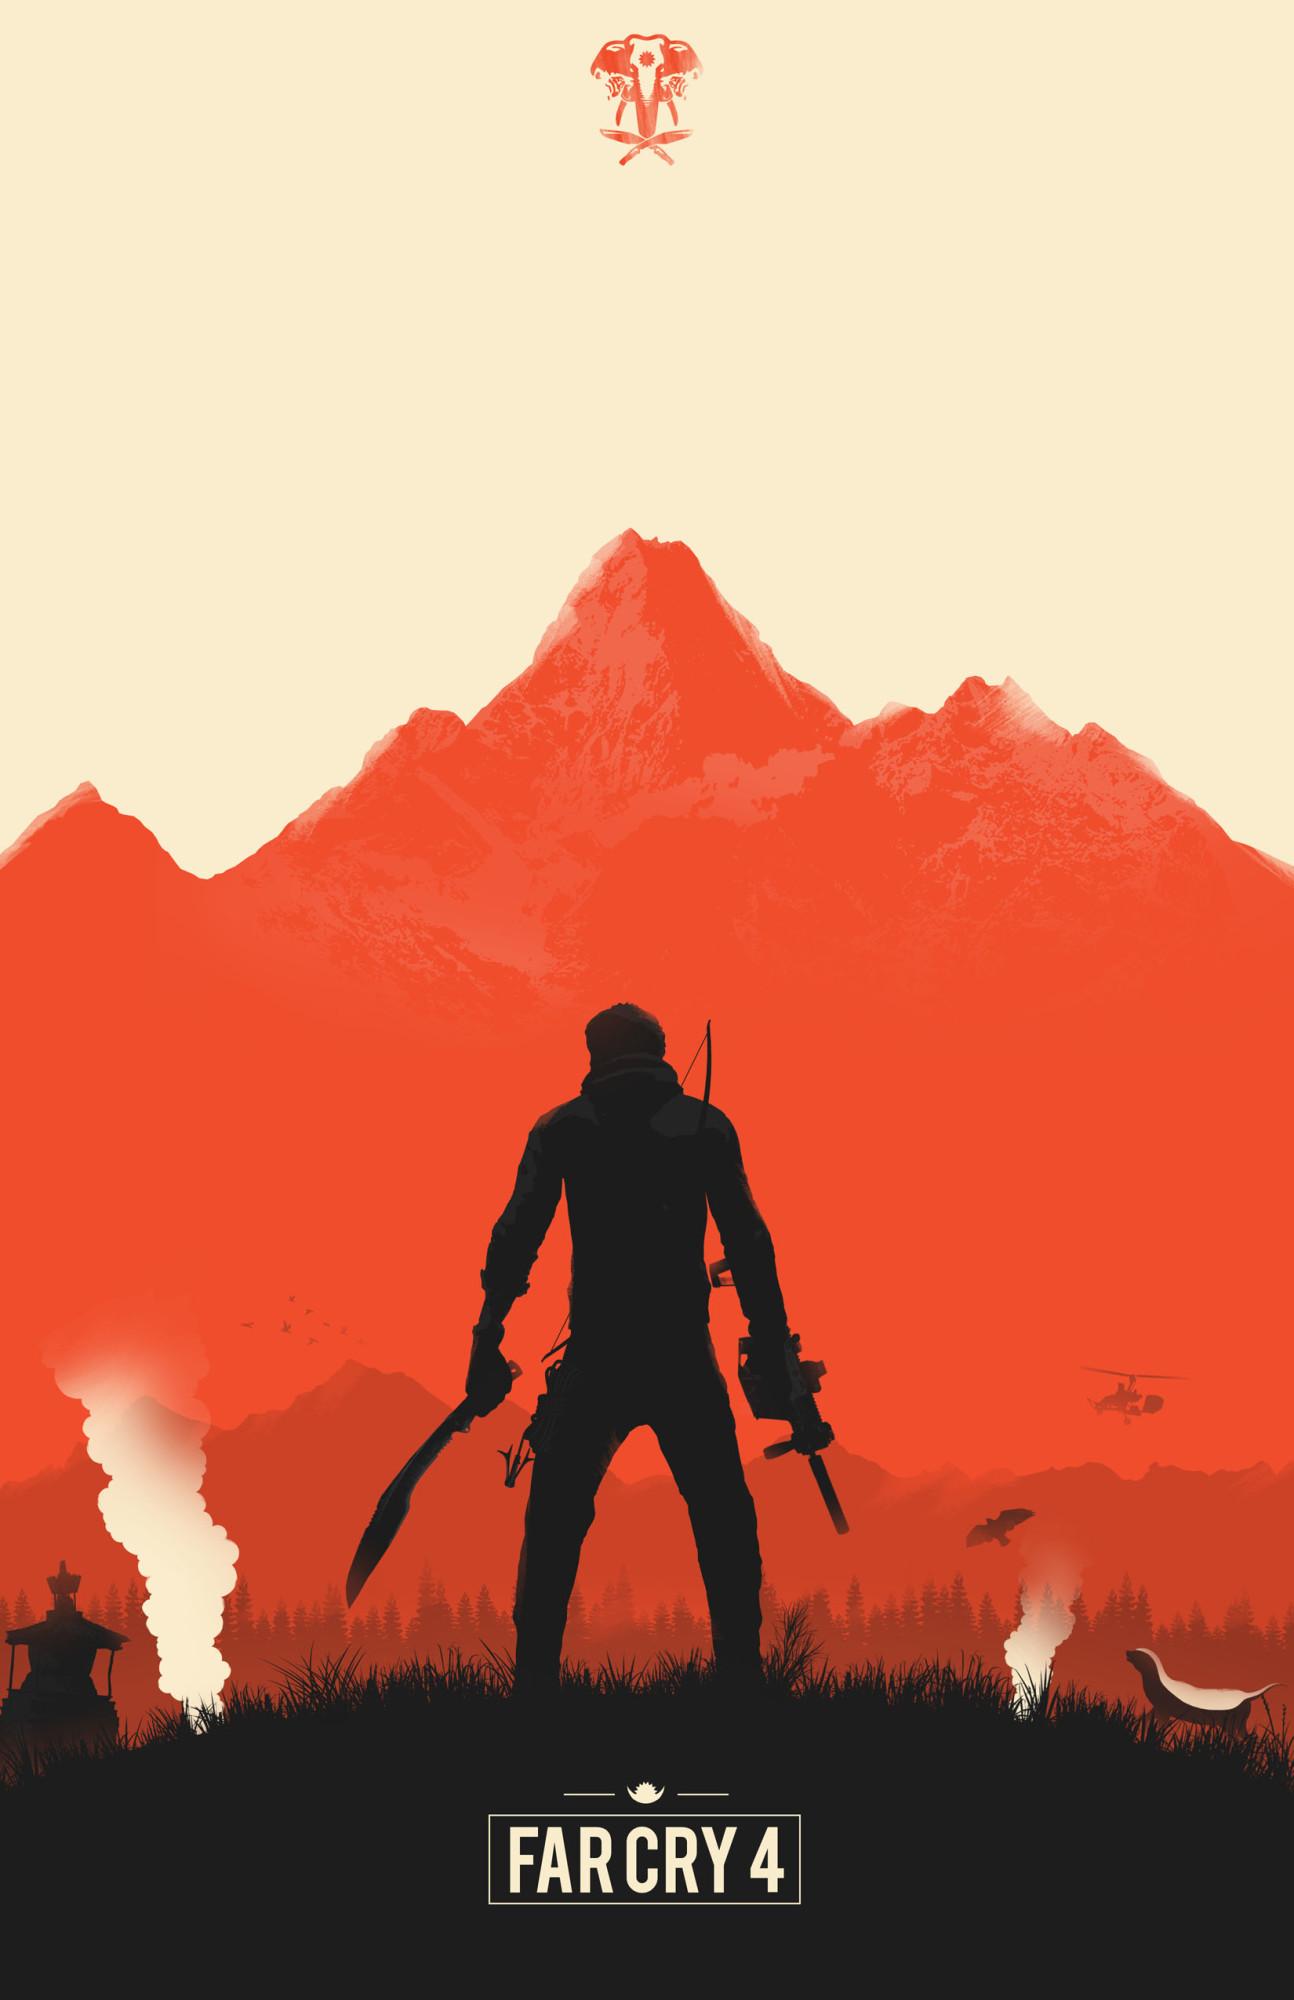 far cry 6 poster art